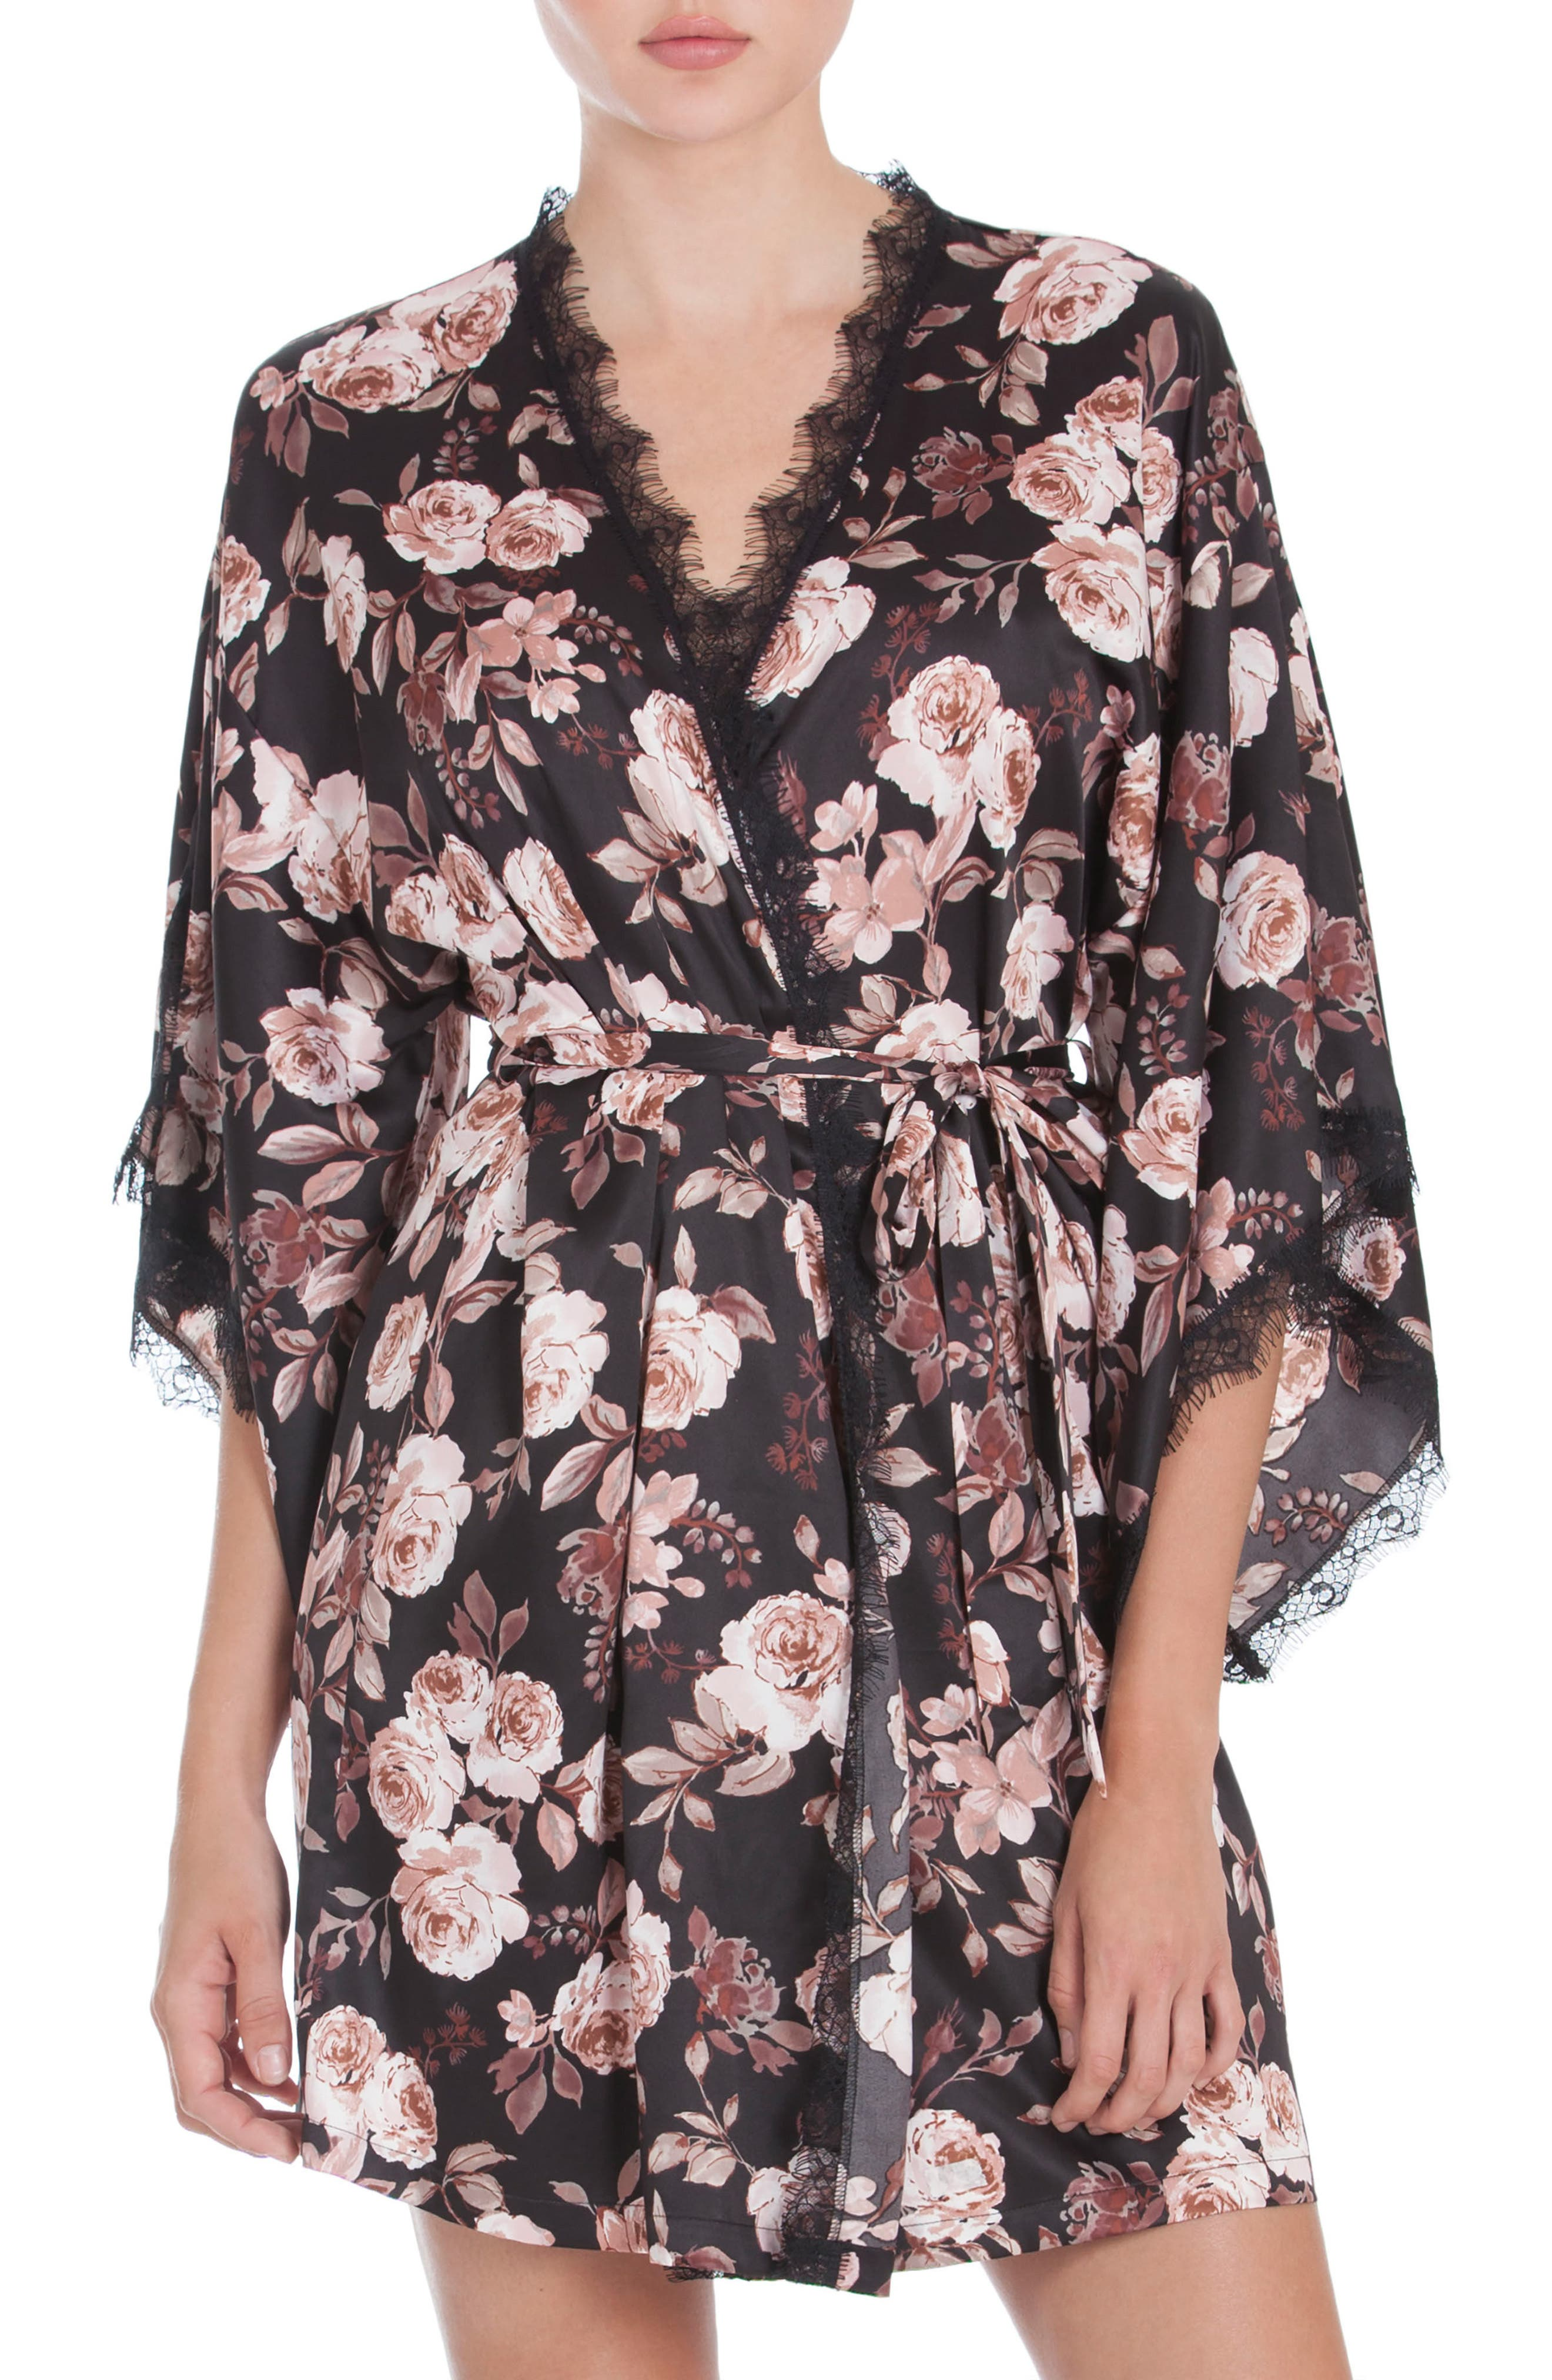 Floral Print Kimono Robe,                         Main,                         color, Black Ground Rose Floral Print